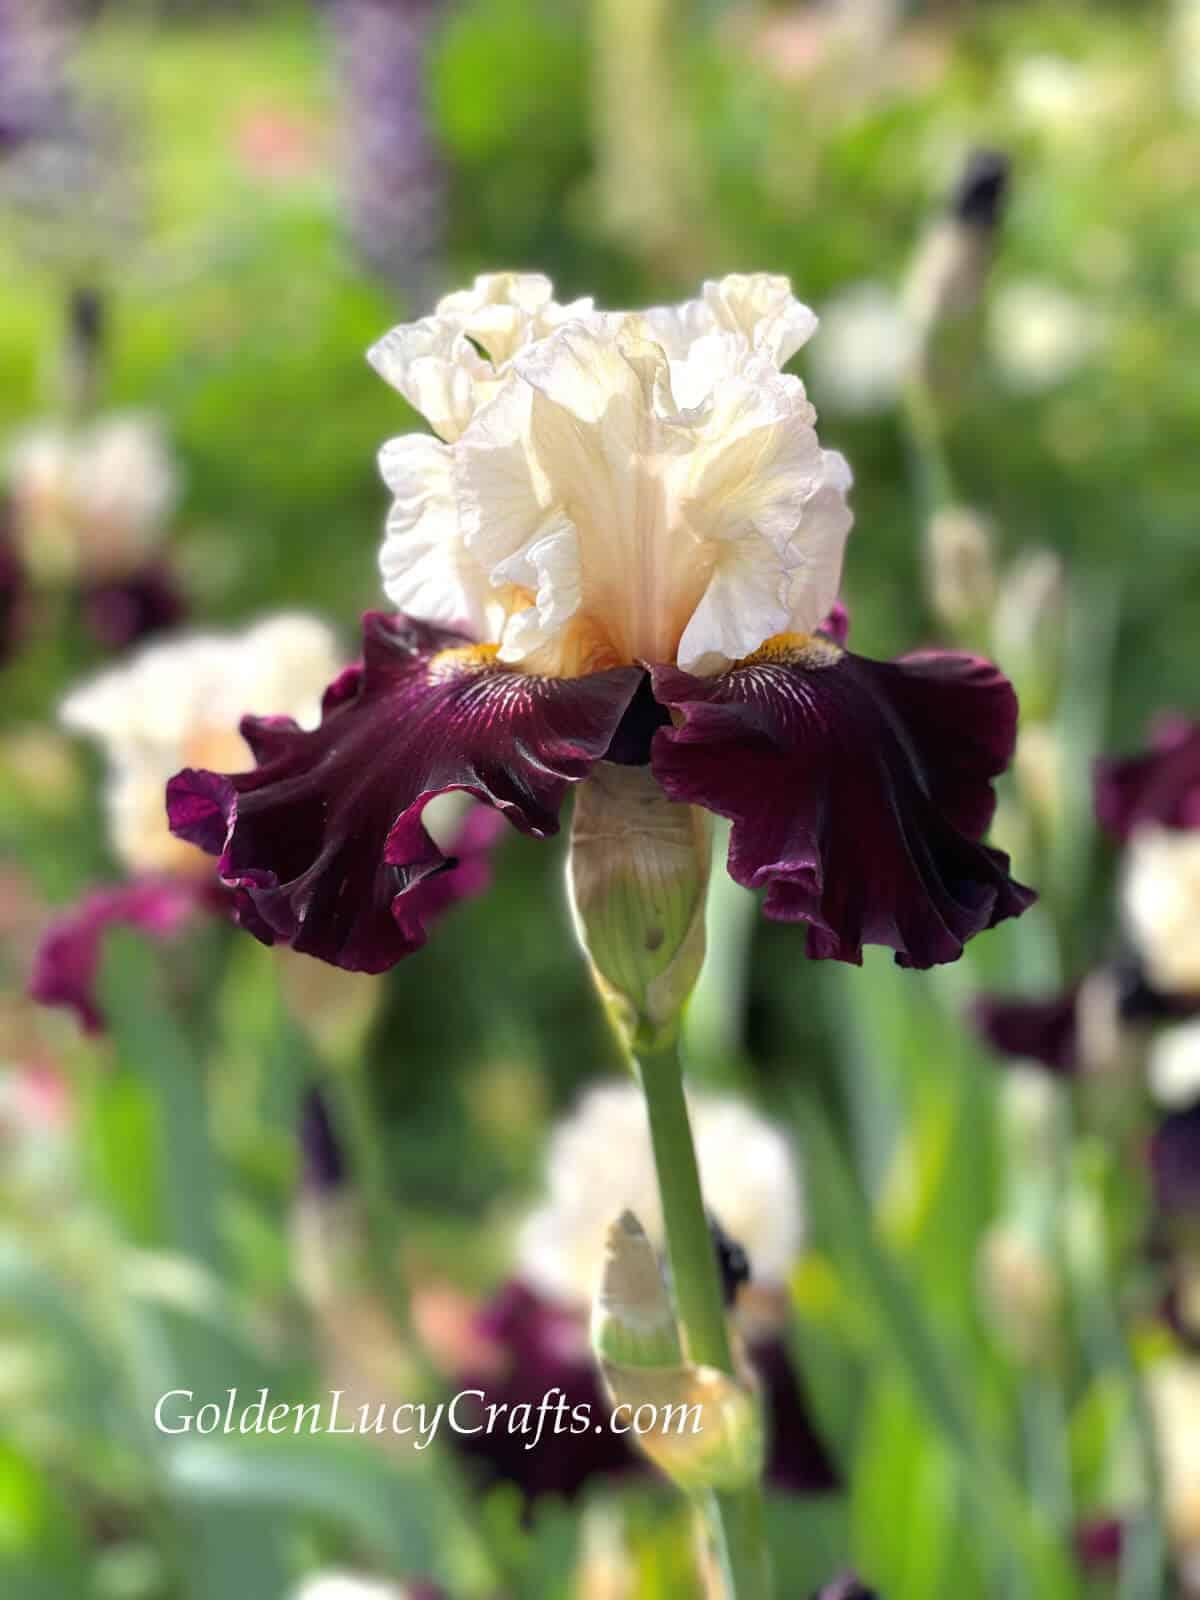 Iris - white top petals and purple lower petals.